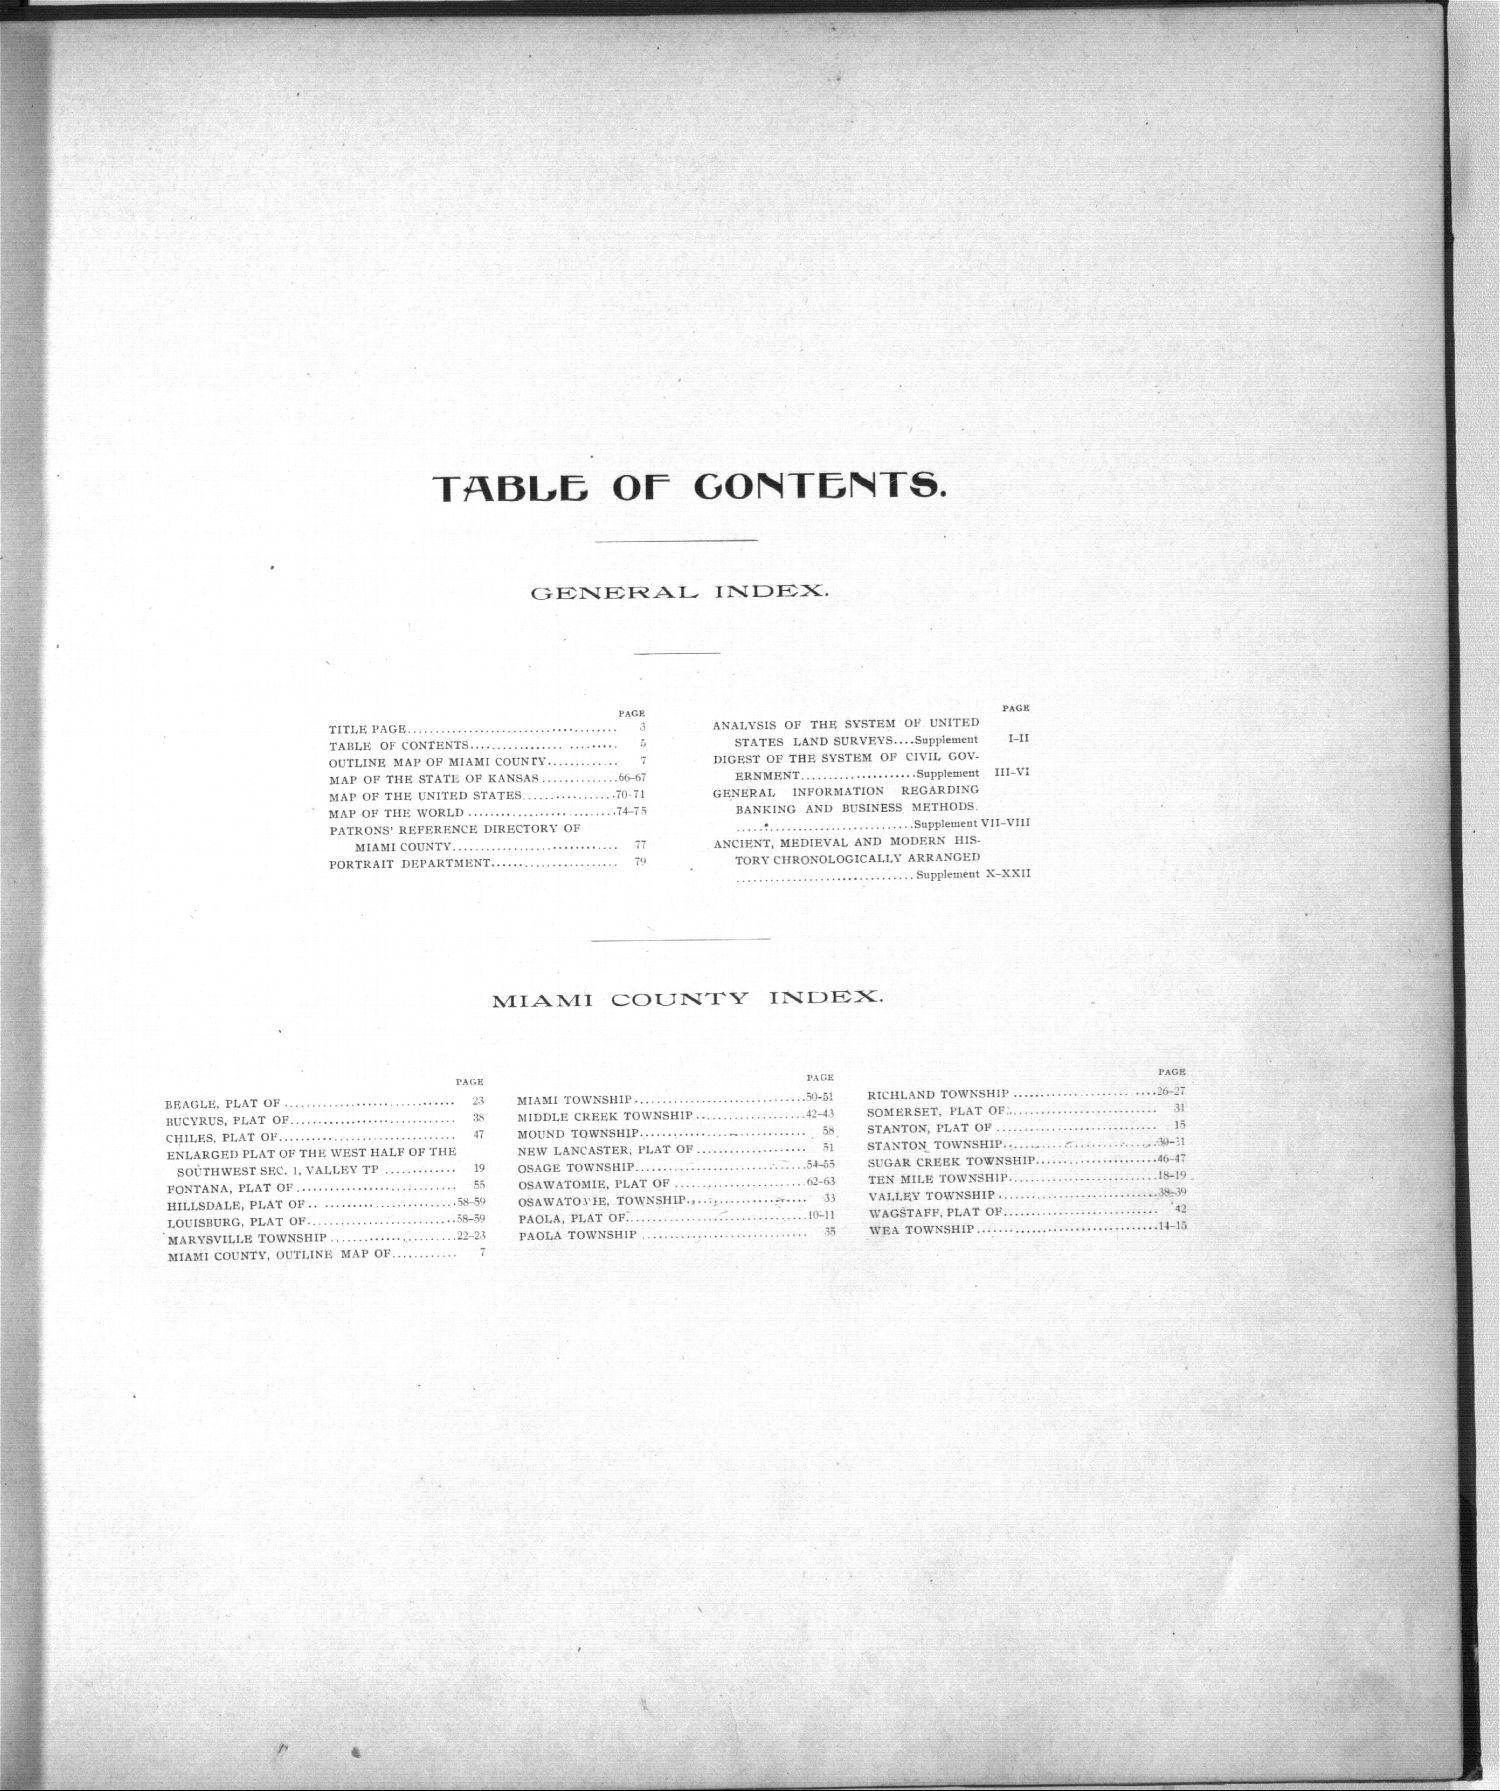 Standard atlas, Miami County, Kansas - Table of Contents